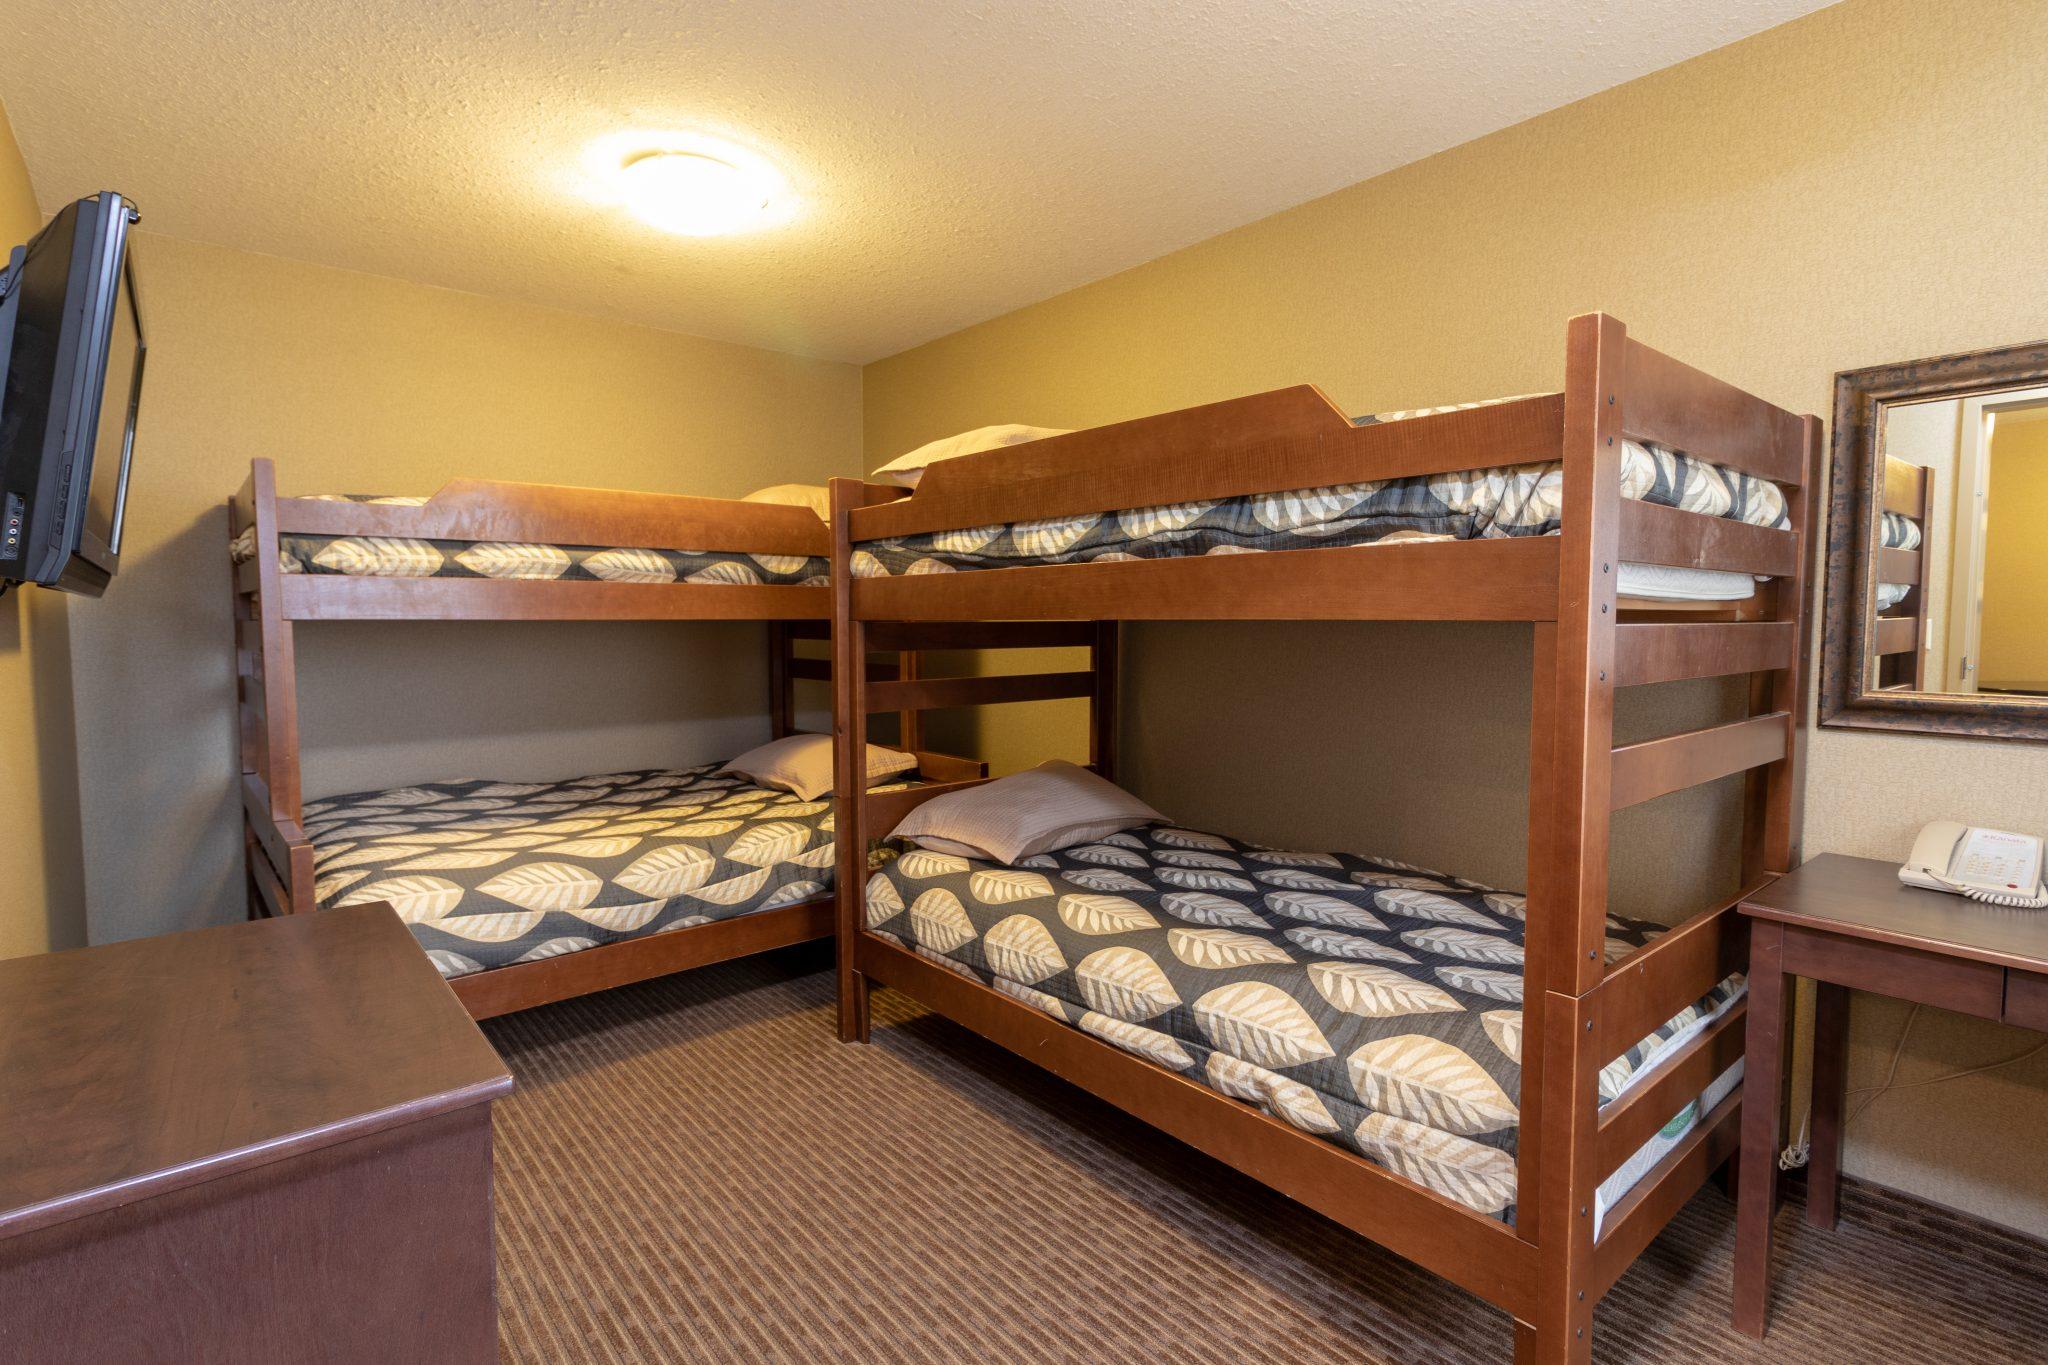 hotel in fort saskatchewan Kanata Inns Fort Saskatchewan Family_FS1